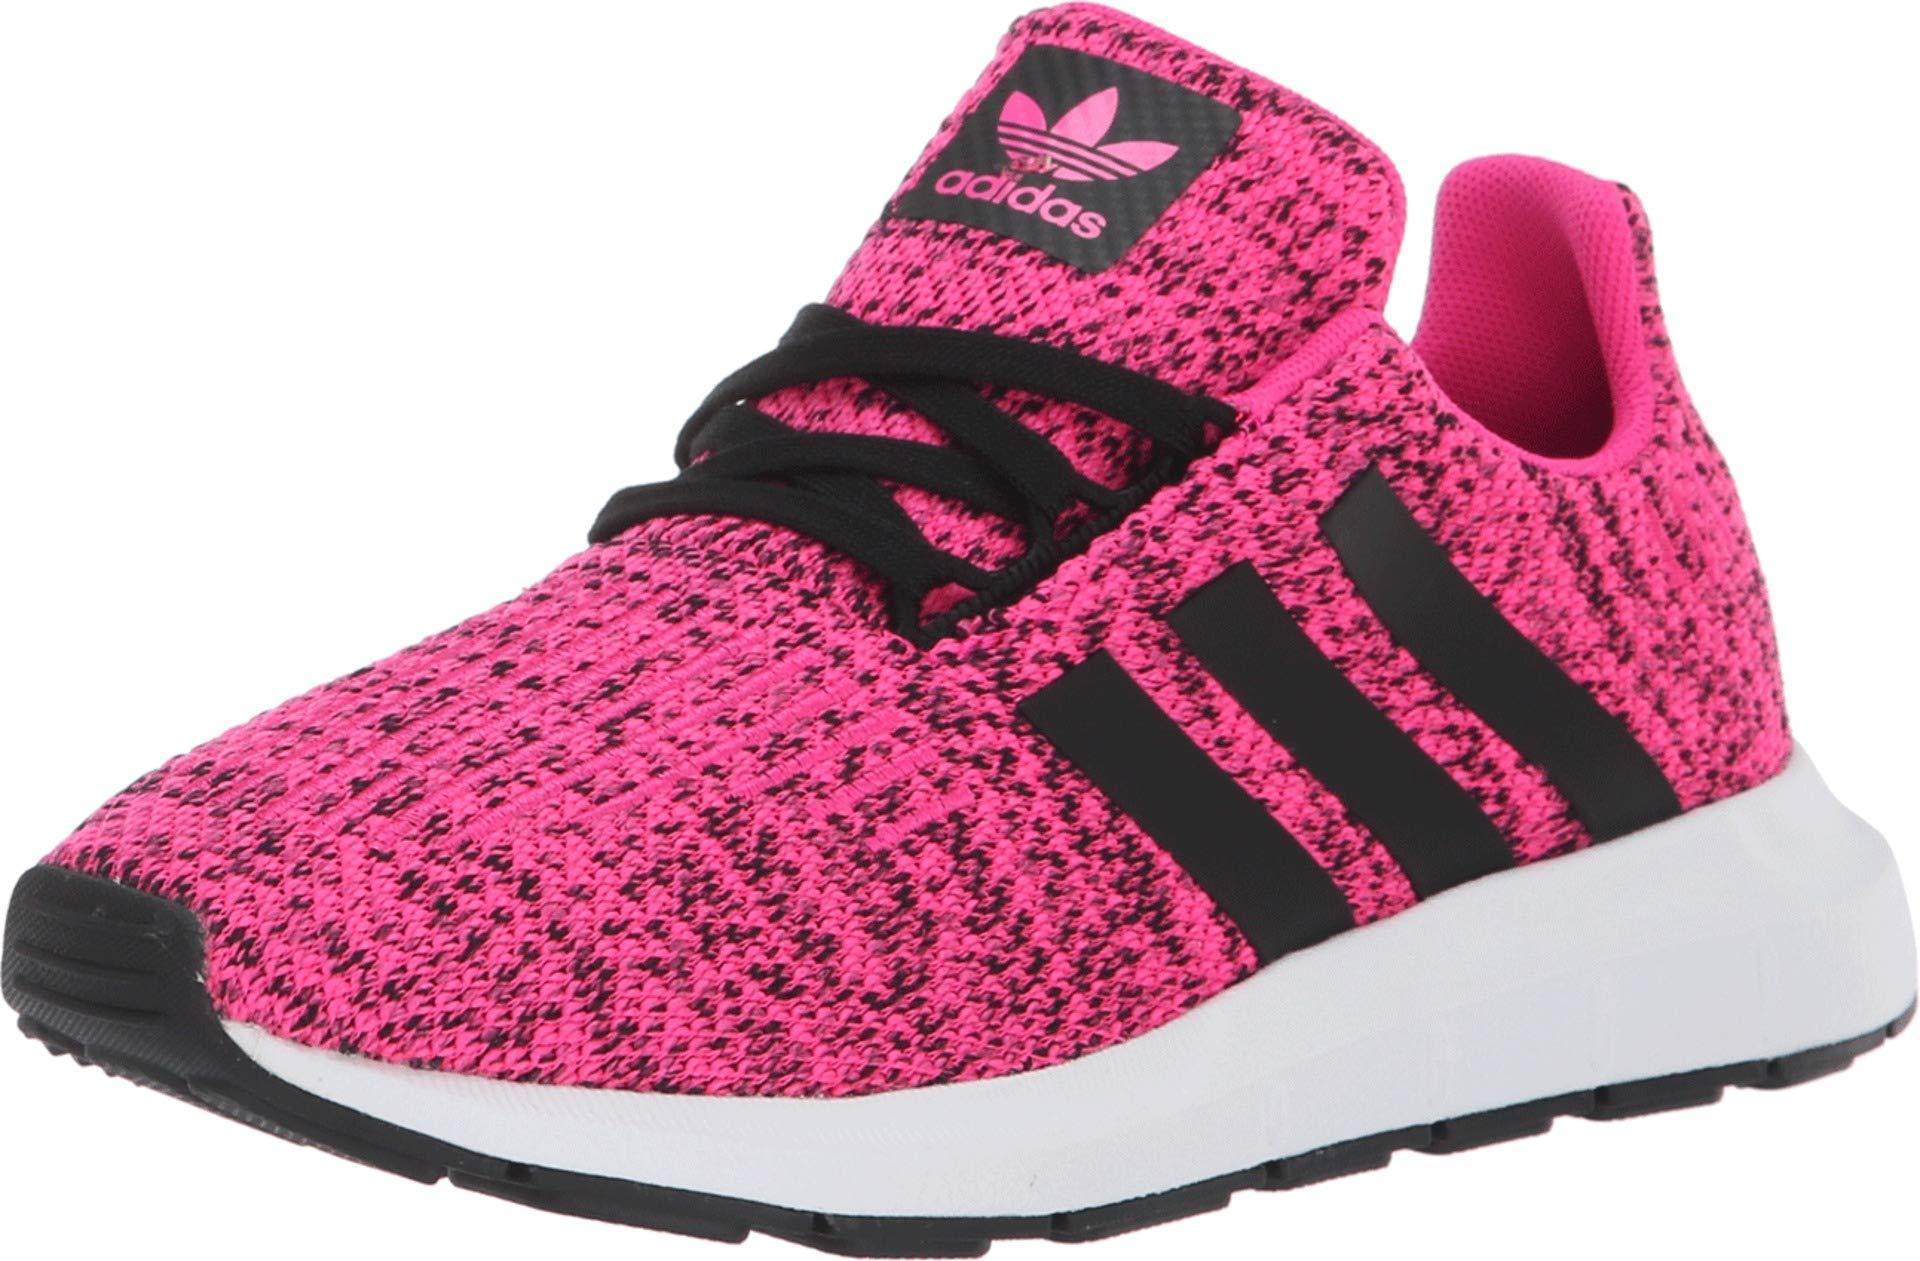 adidas Originals Kids Girl's Swift Run C (Little Kid) Shock Pink/Black 12 M US Little Kid